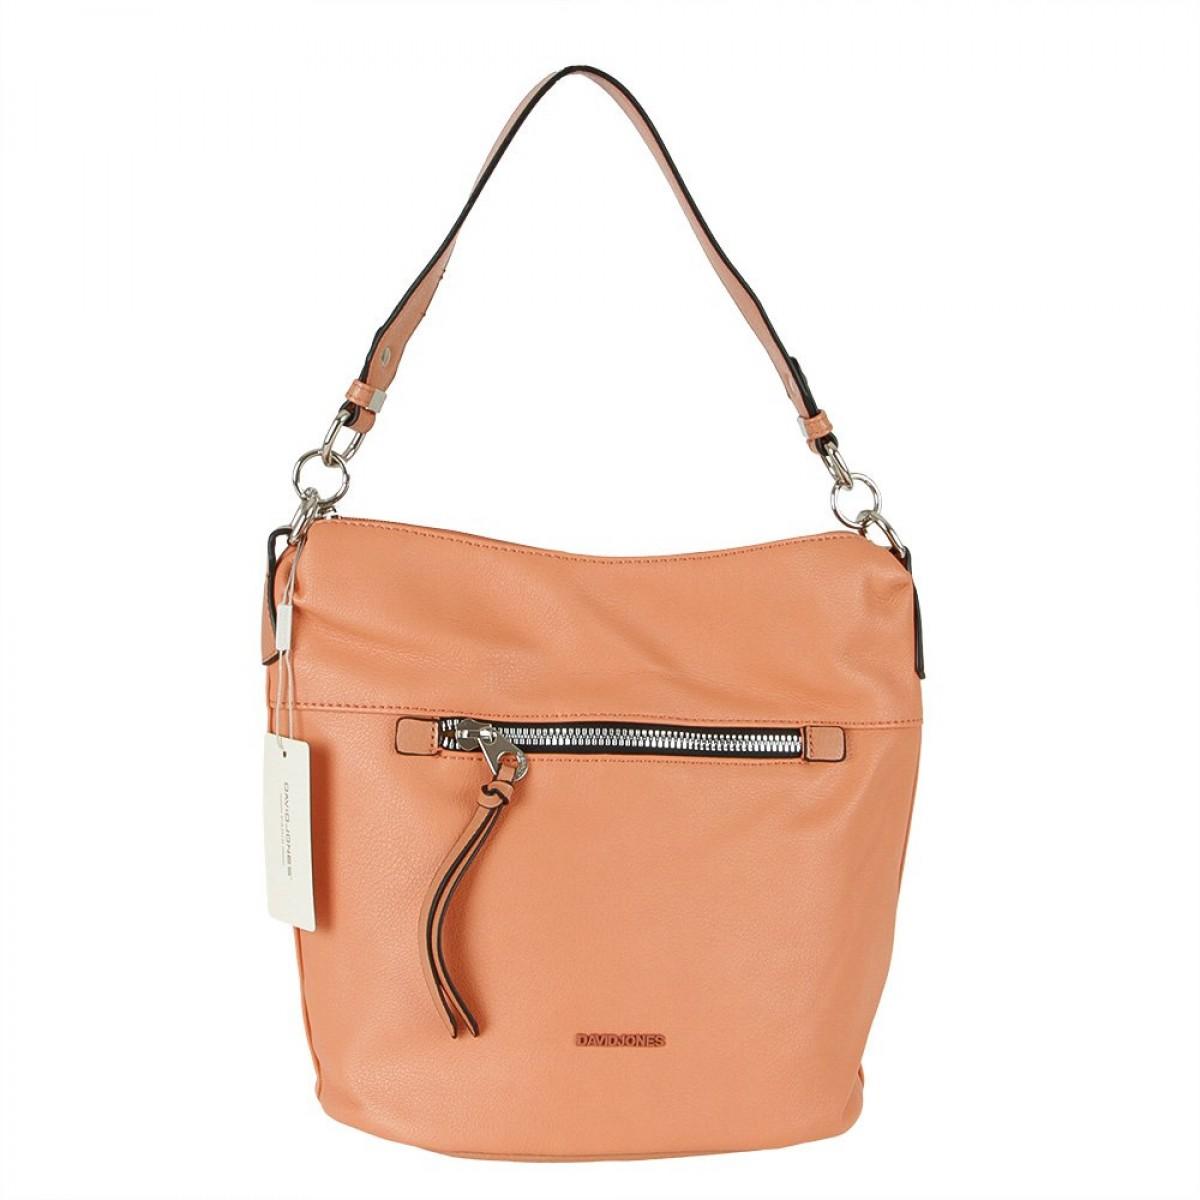 Жіноча сумка David Jones 6296-1 CORAL